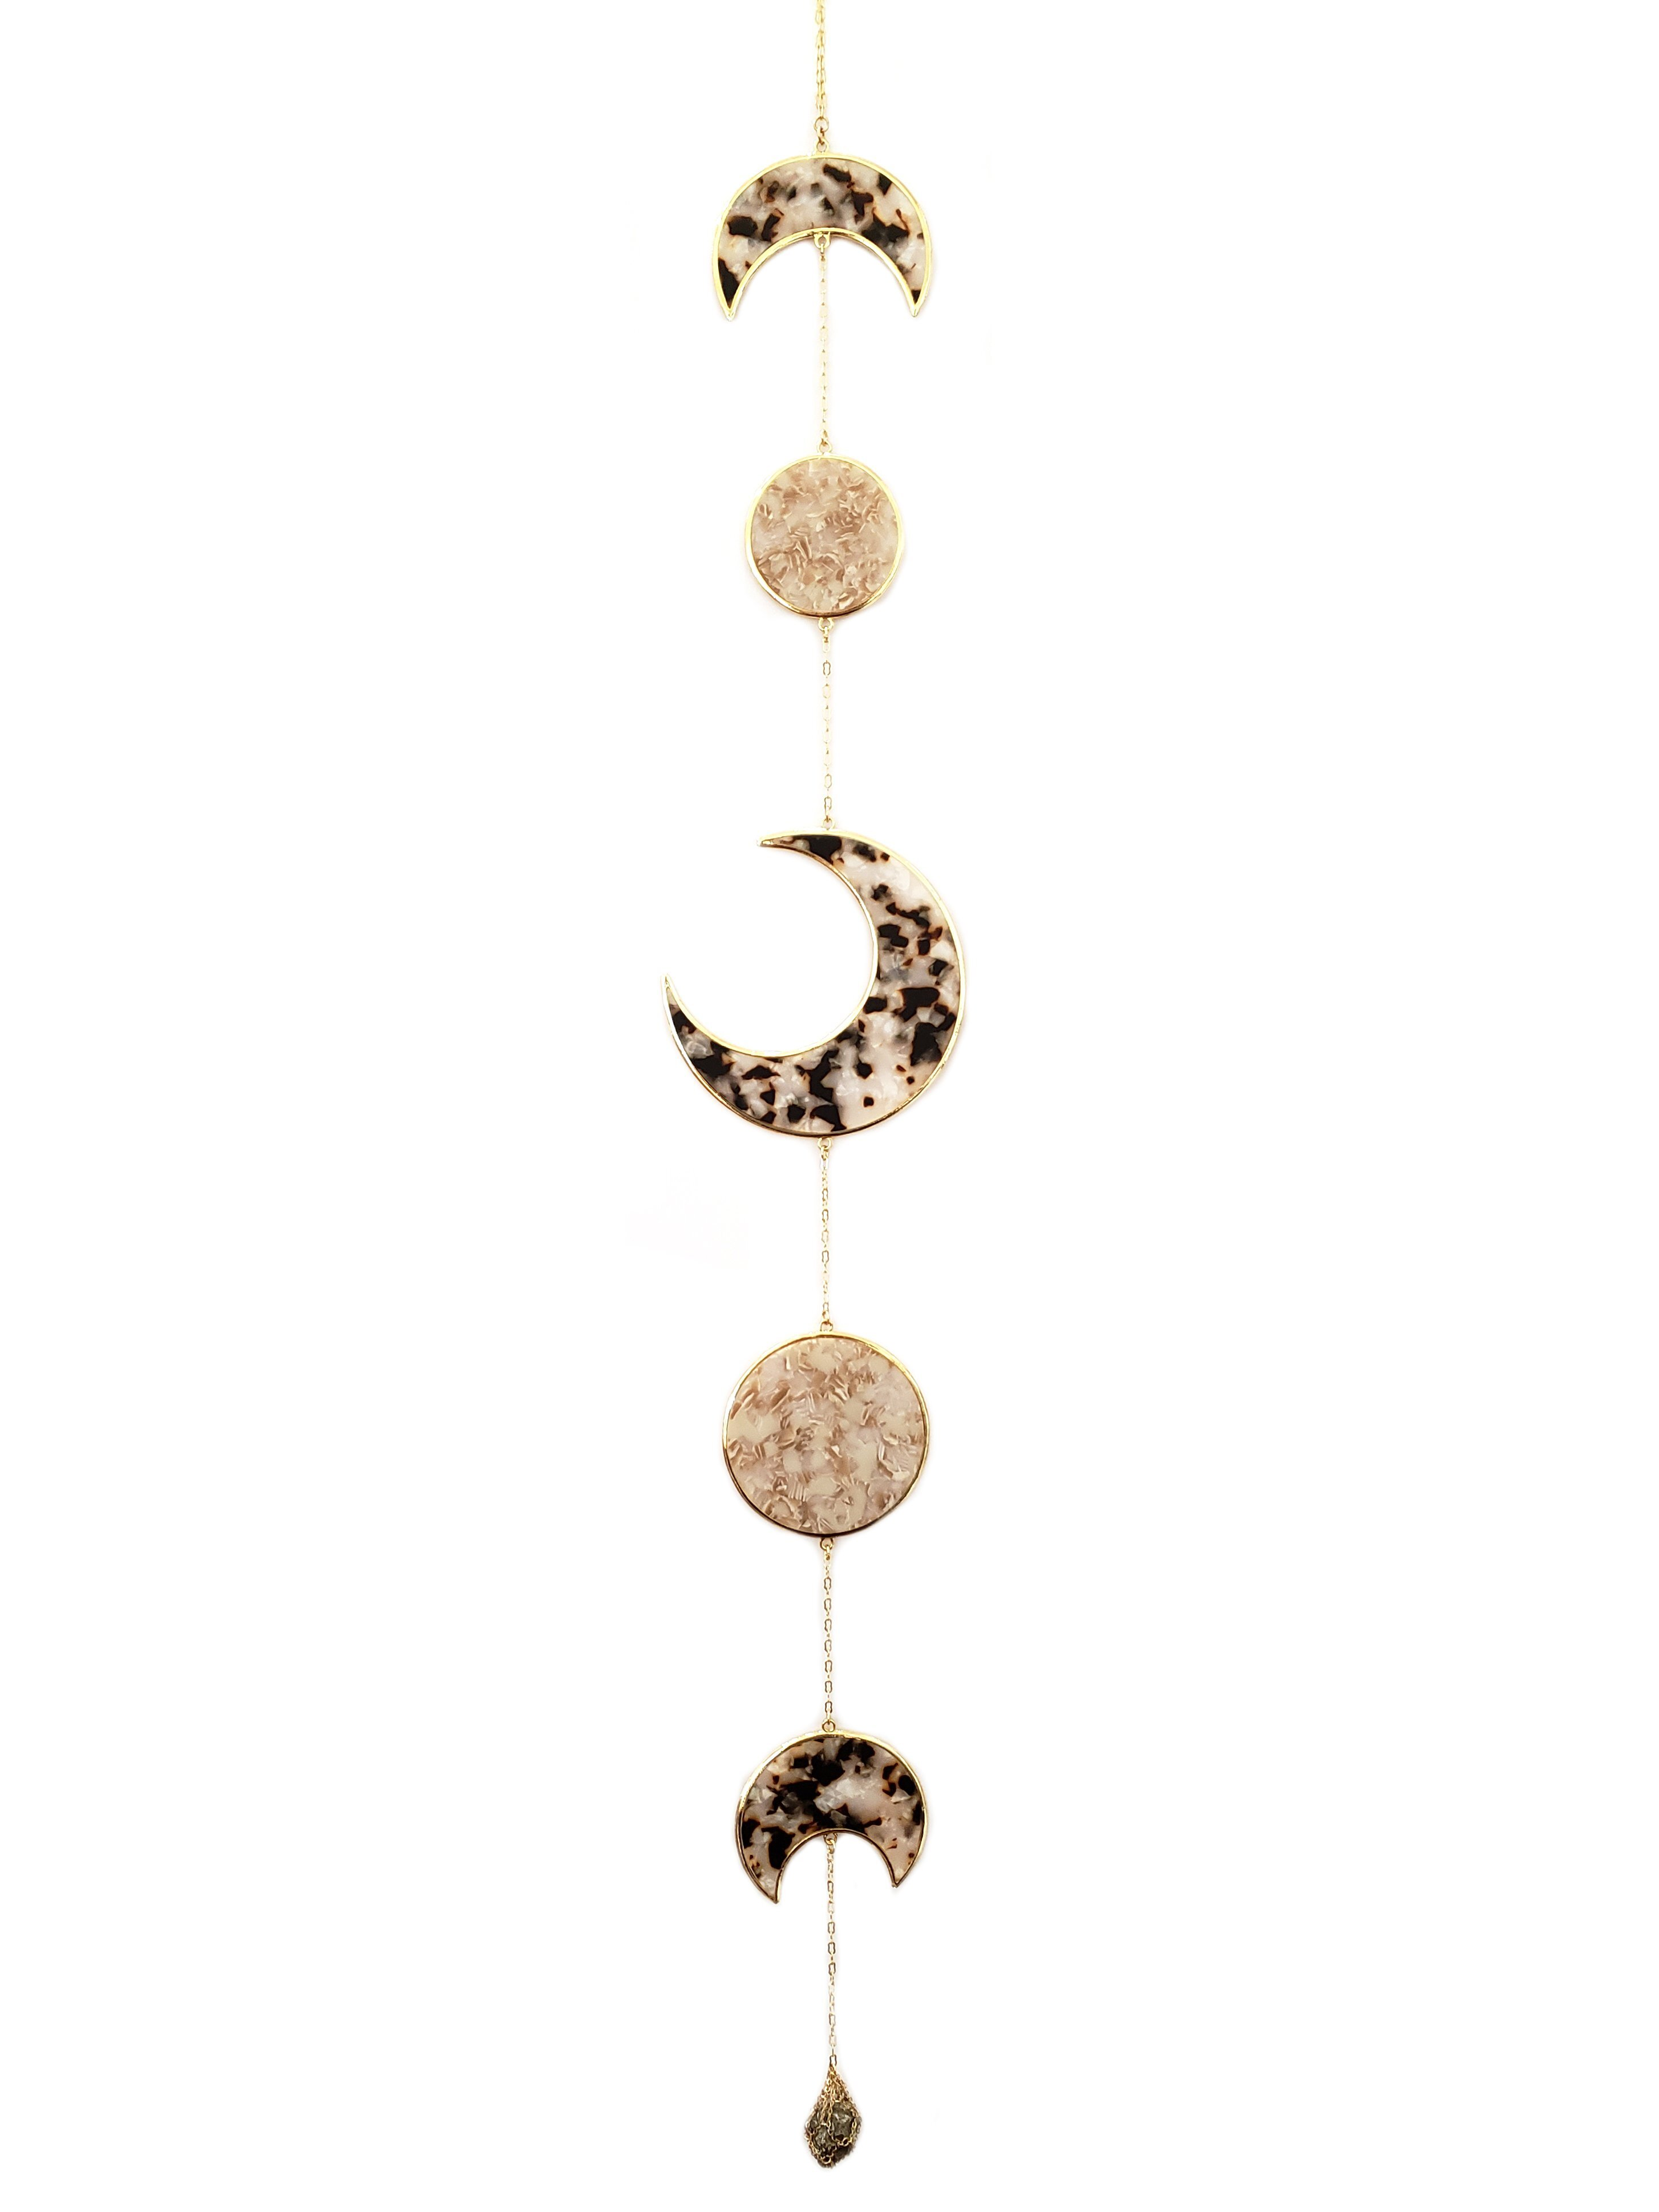 Resin Moon Phase Wall Hanging 月フェイズ壁掛け